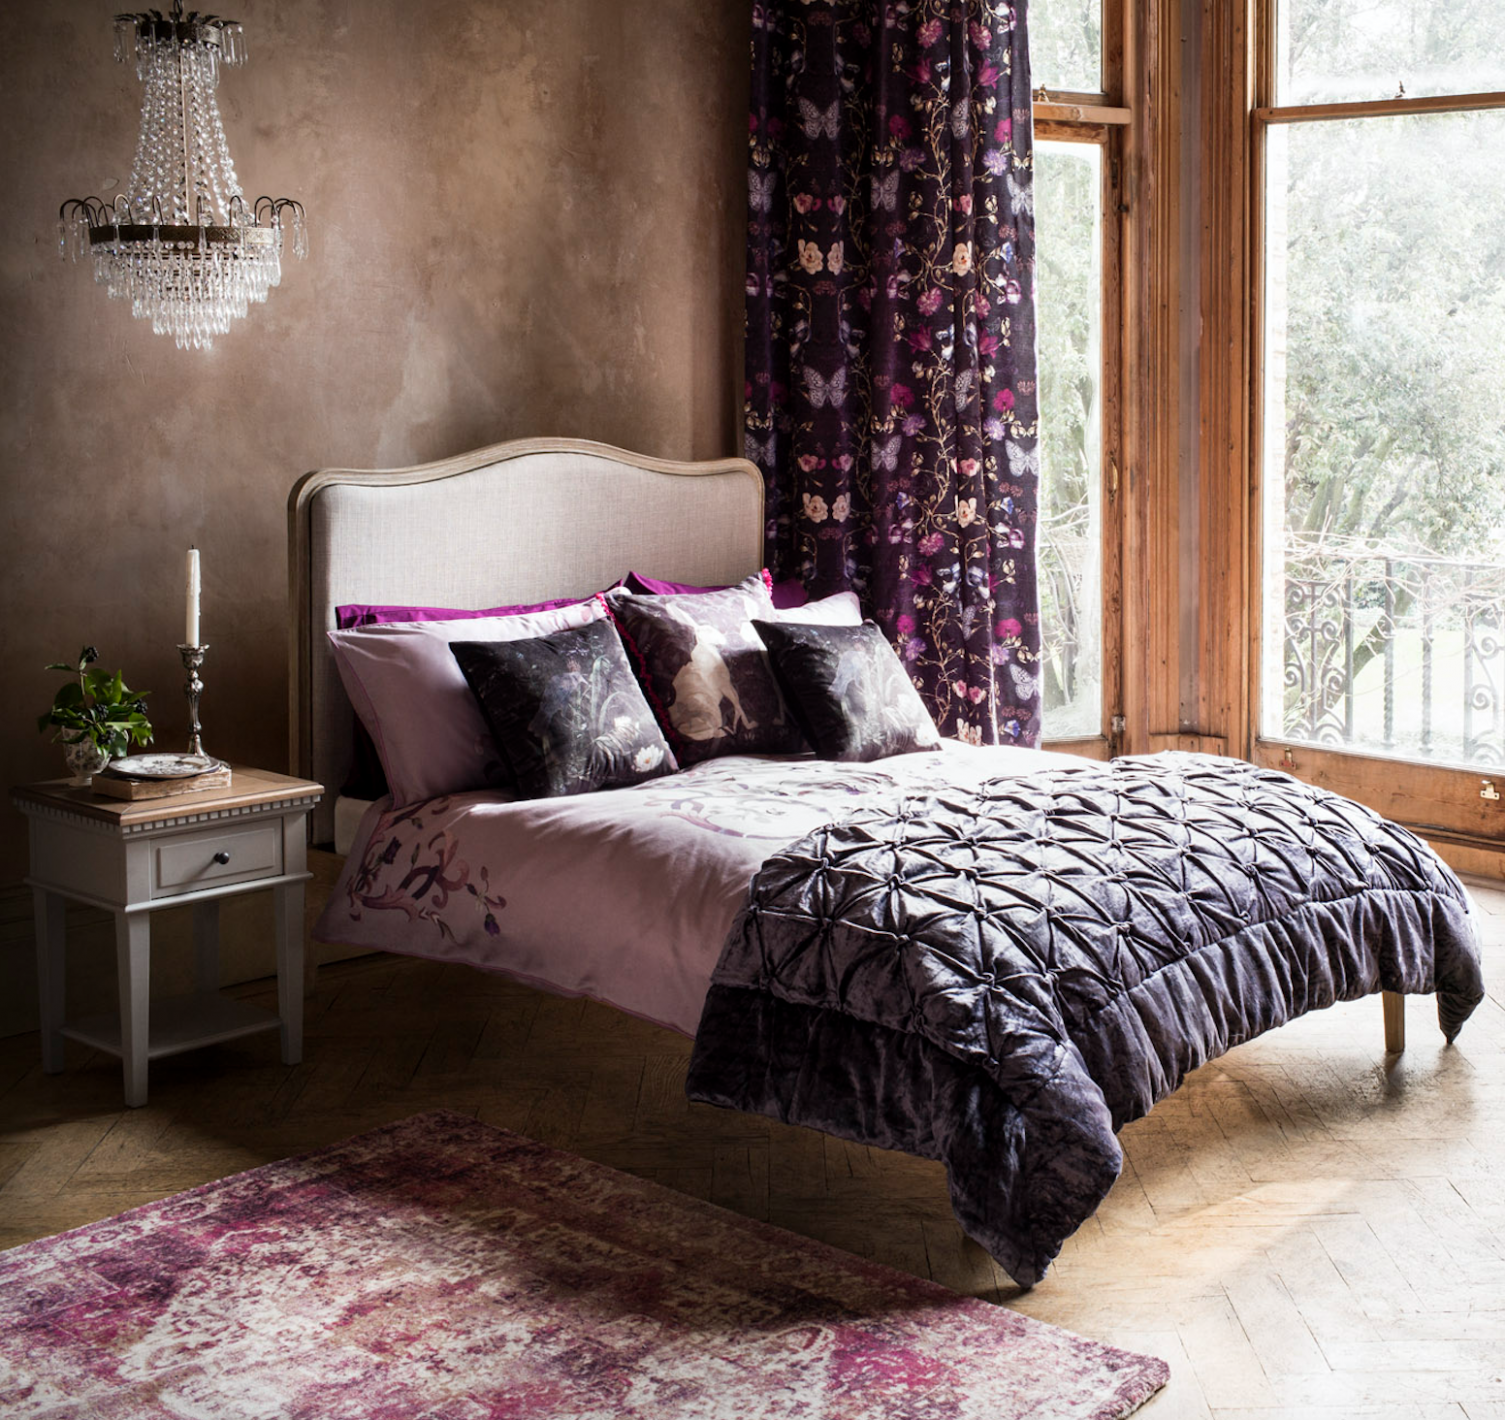 Romantic bedroom ideas  Decorating Ideas  Interiors - Bedroom Ideas Romantic